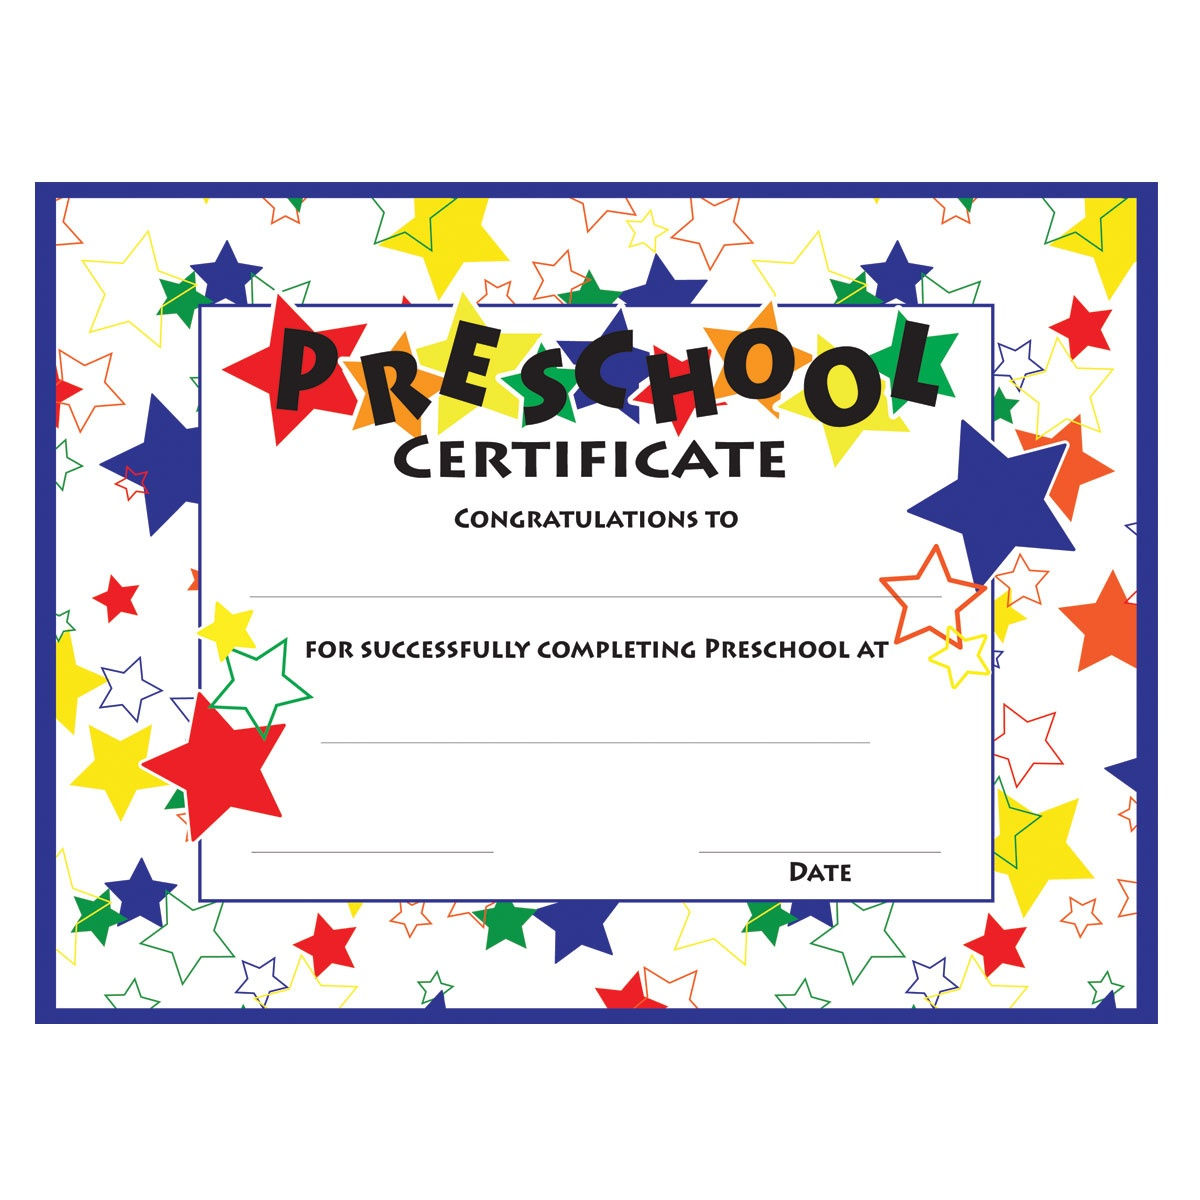 11+ Preschool Certificate Templates - Pdf | Free & Premium Templates - Free Printable Preschool Diplomas